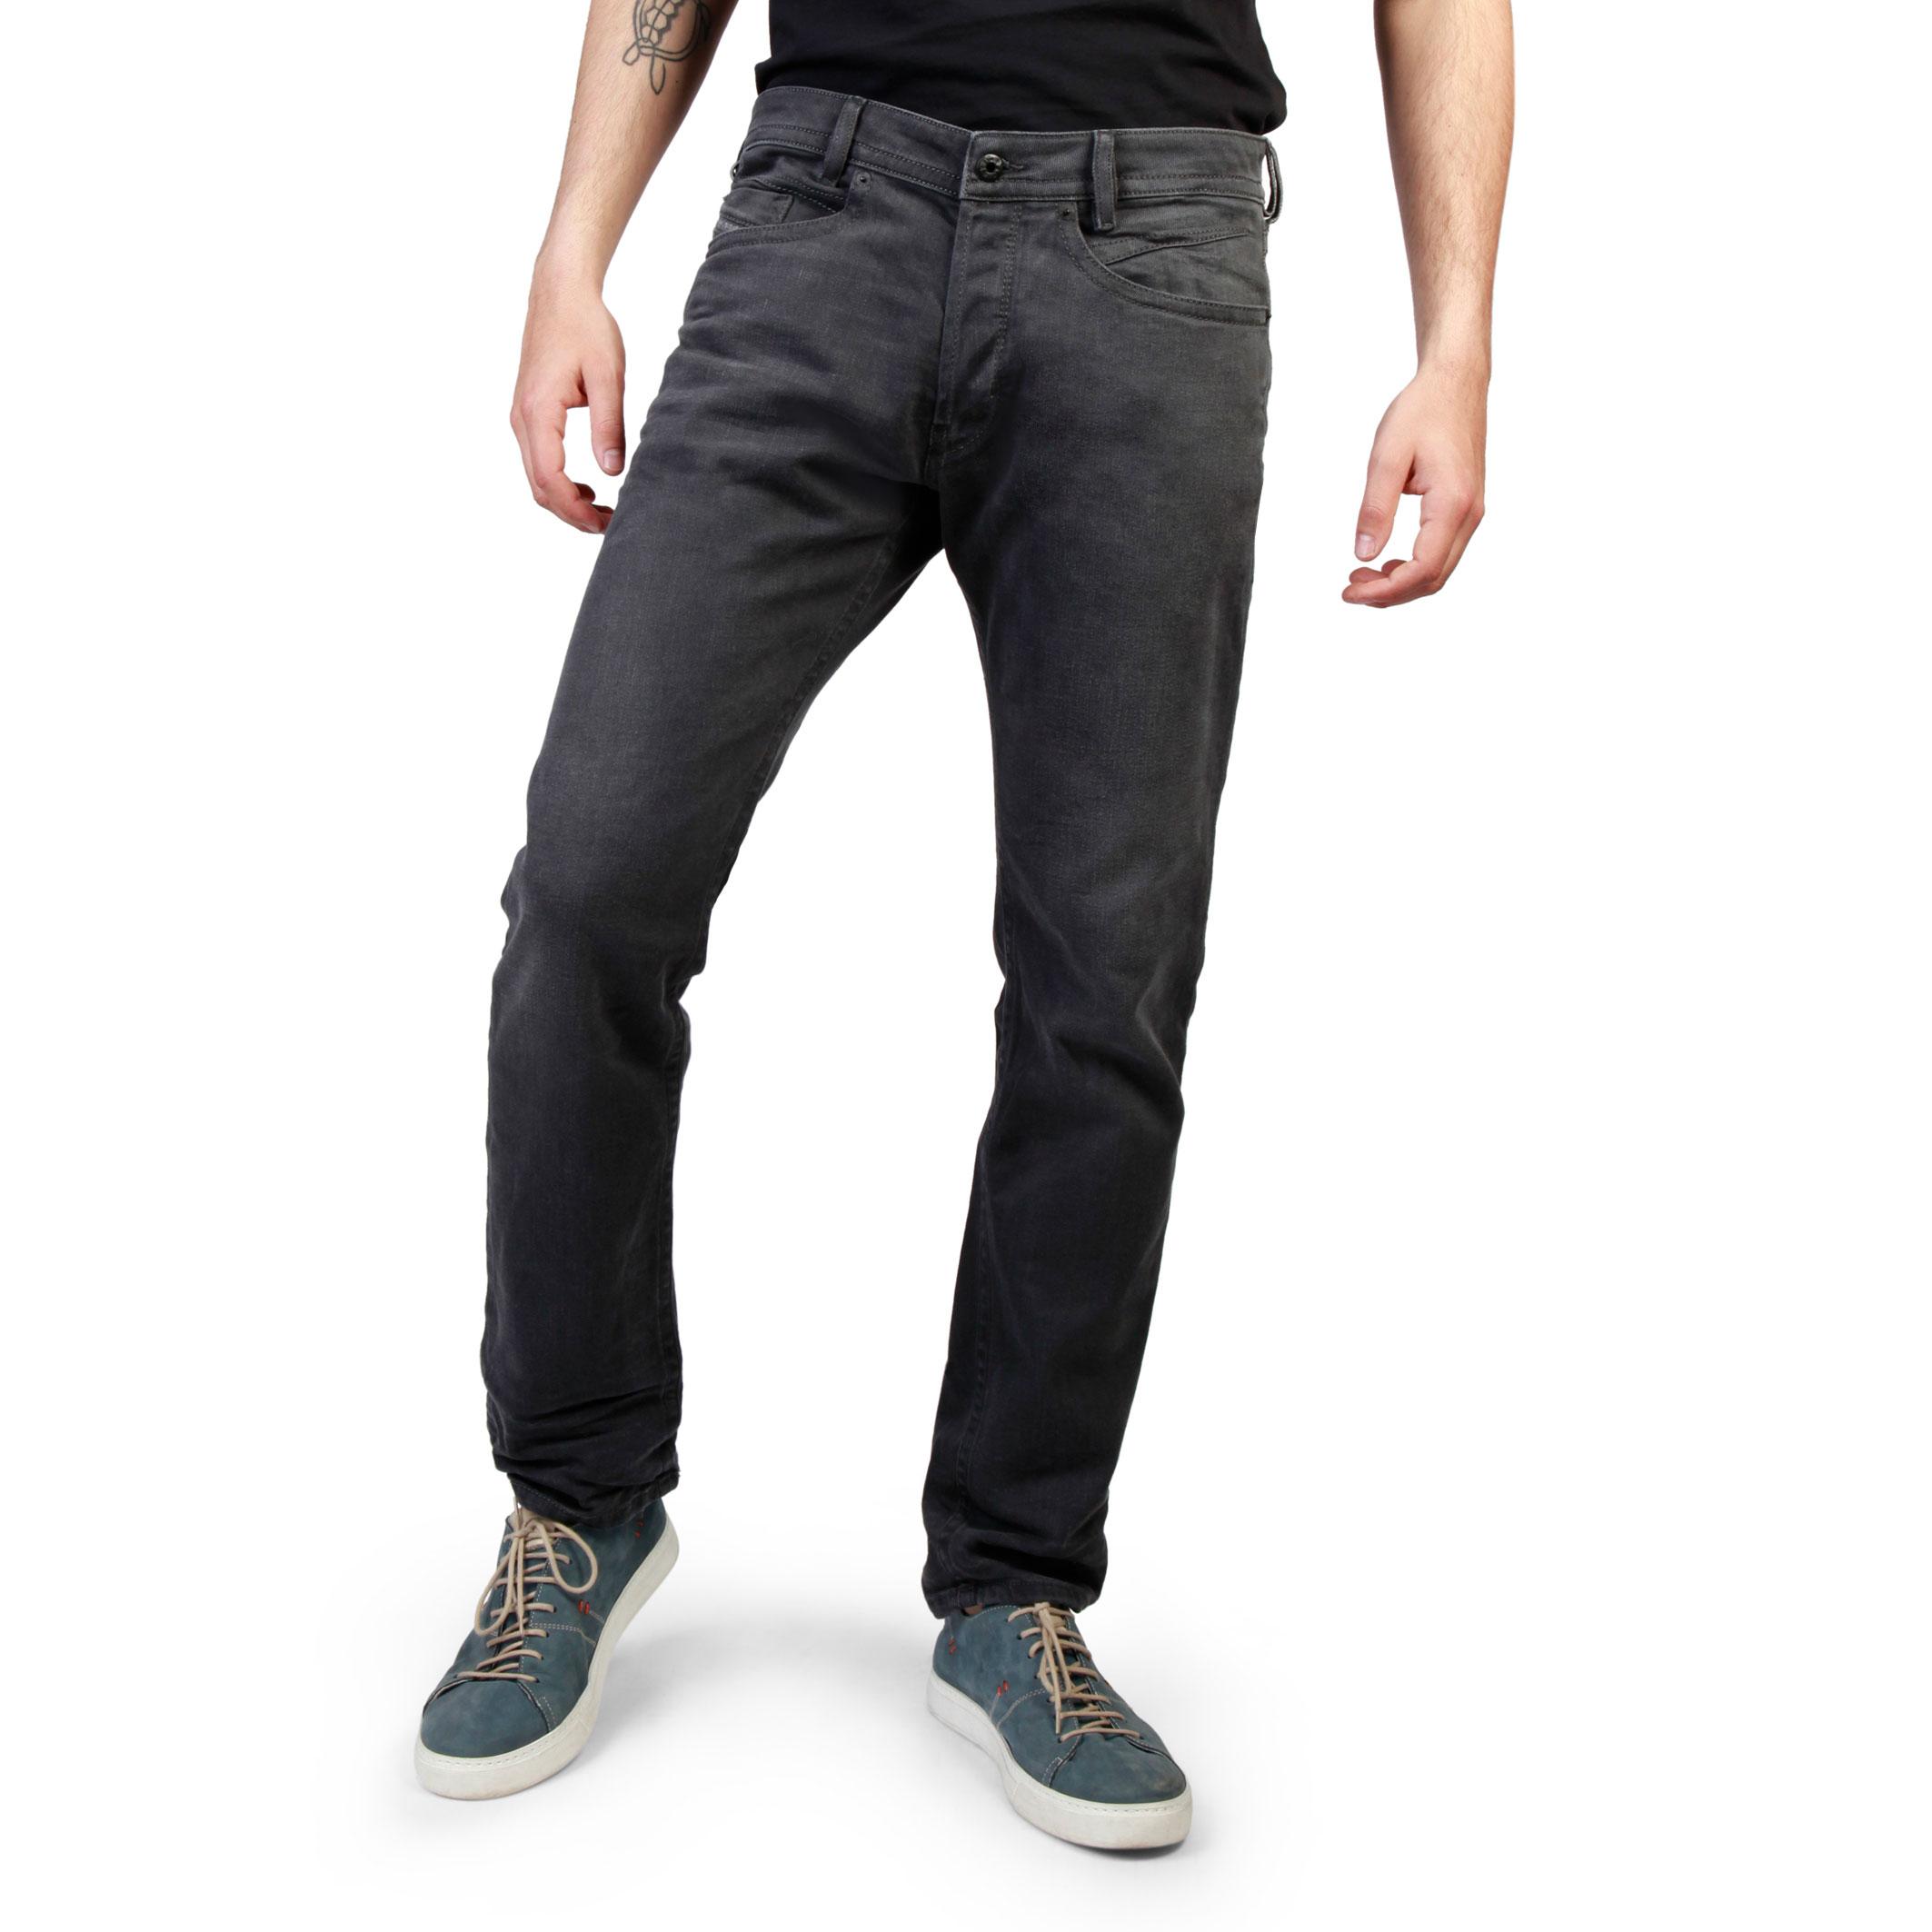 Jeans Diesel AKEE_L32_00SR61 Uomo Nero 89986